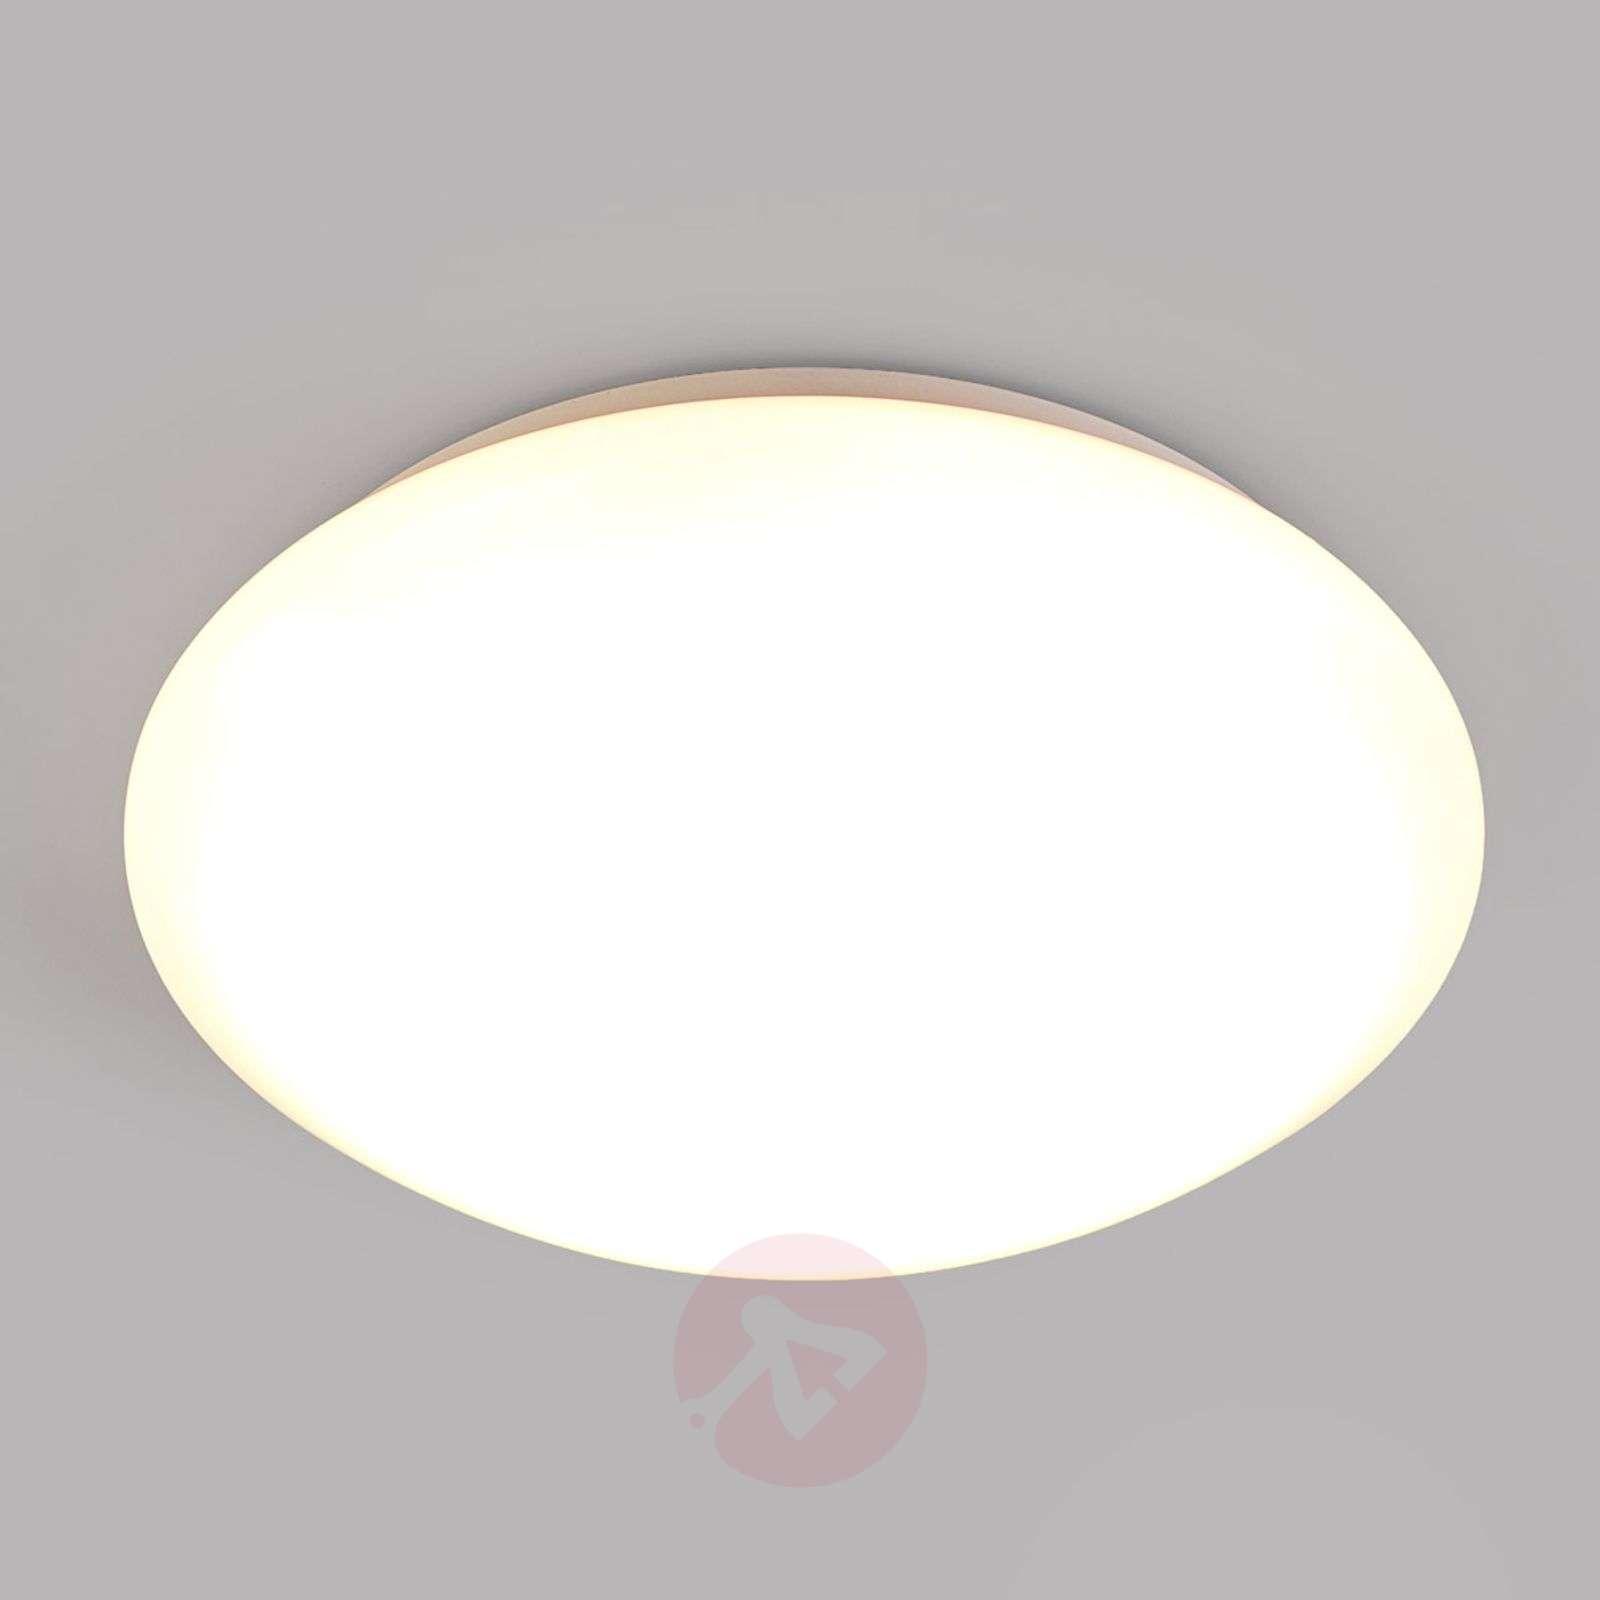 Simple led bathroom ceiling lamp selveta 30 cm lights simple led bathroom ceiling lamp selveta 30 cm 9945030 01 aloadofball Gallery